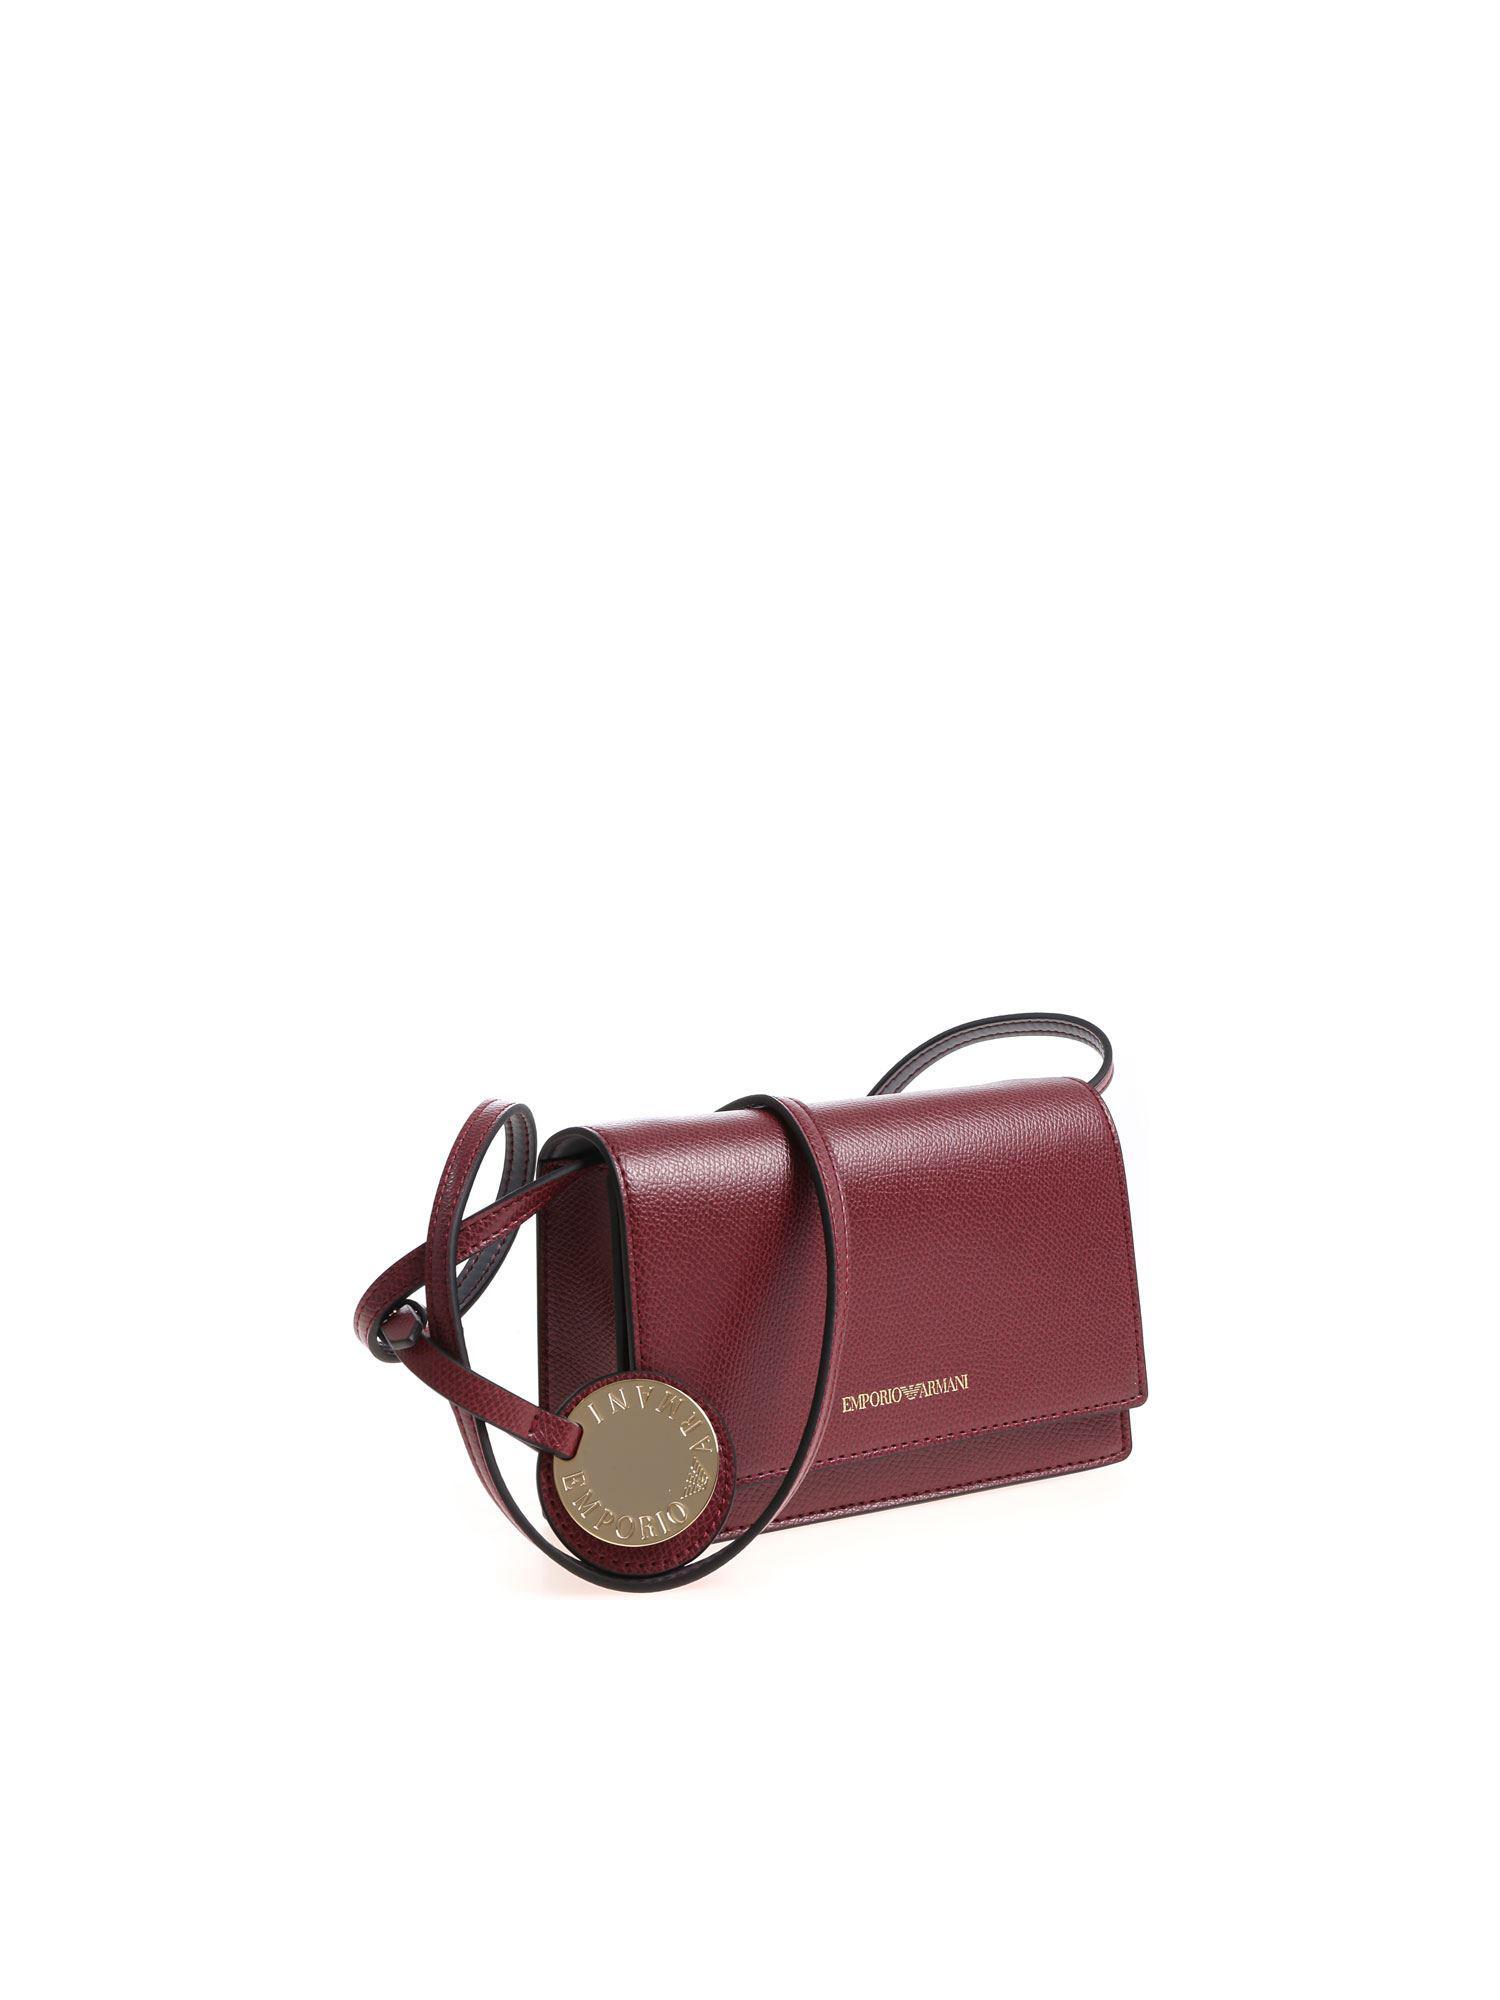 04de918608be Emporio Armani Burgundy Shoulder Bag With Golden Logo in Purple - Lyst